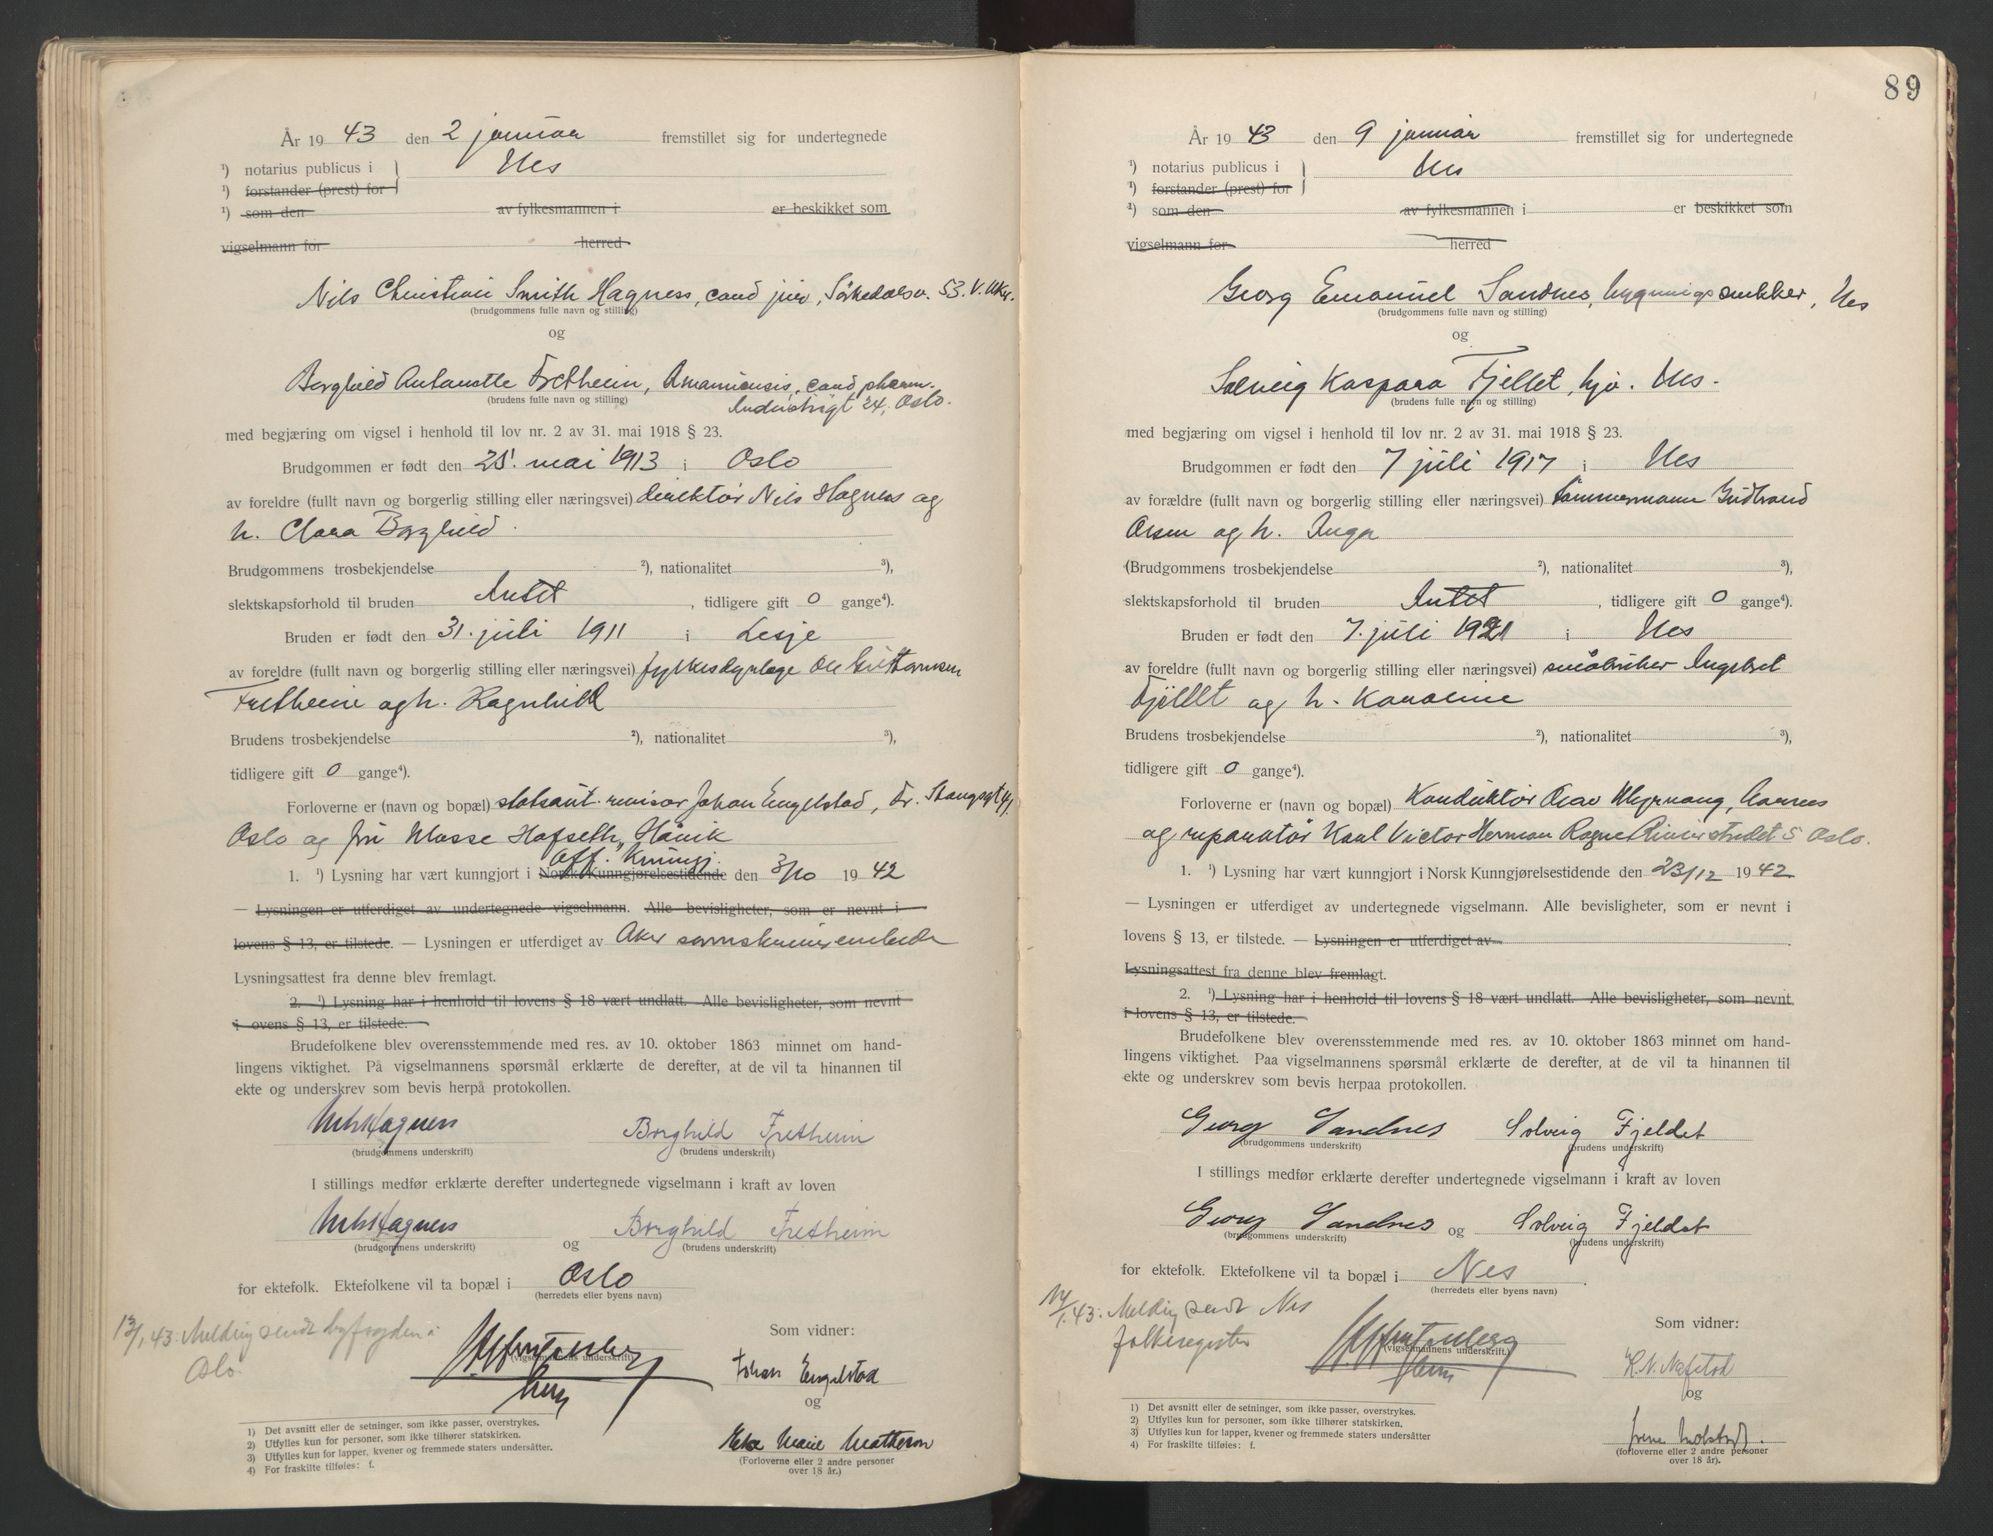 SAO, Nes tingrett, L/Lc/Lca/L0001: Vigselbok, 1920-1943, s. 89